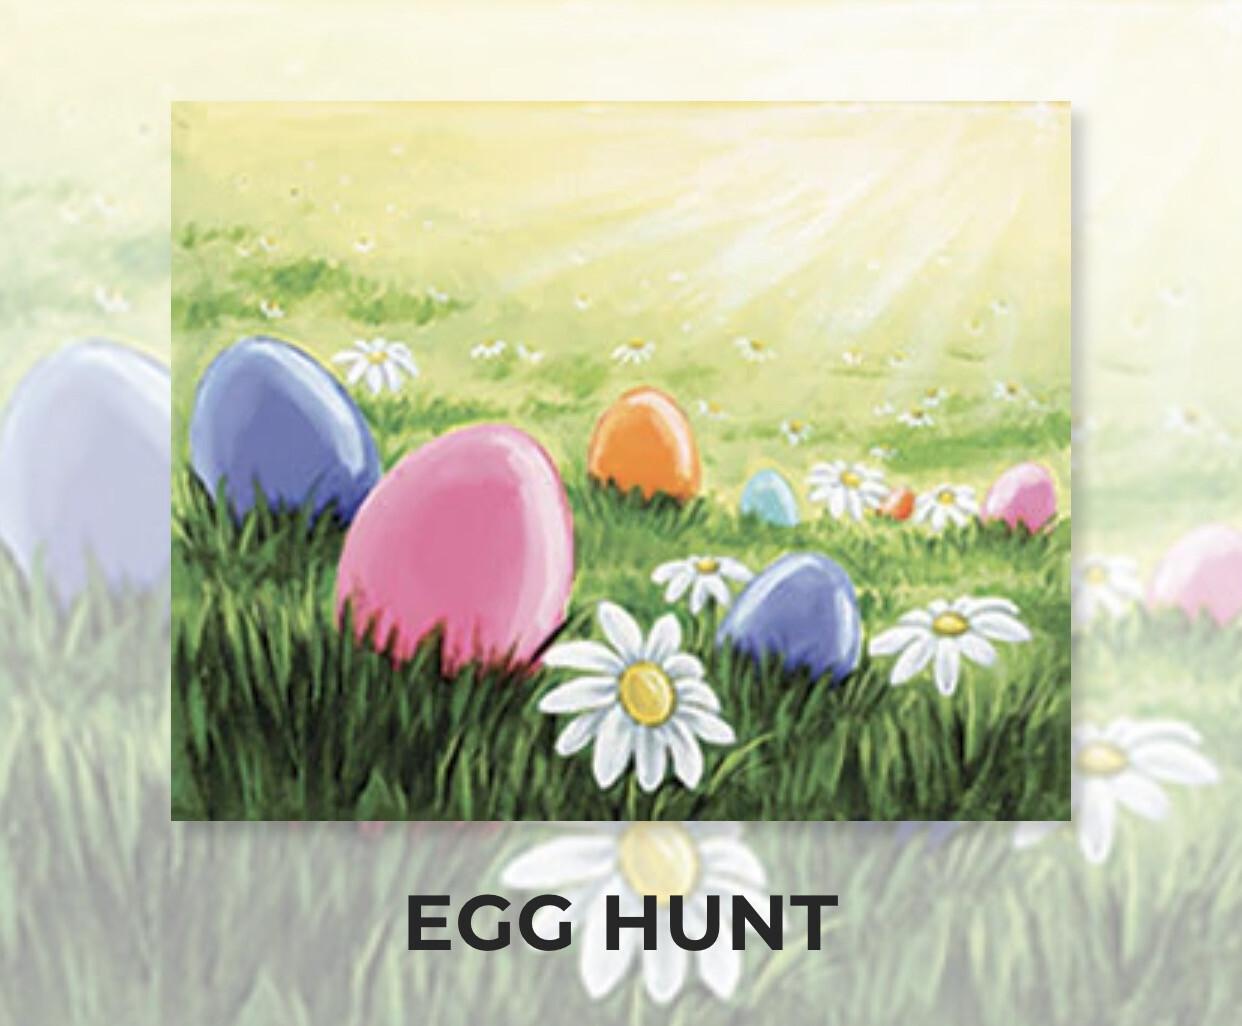 Egg Hunt ADULT Acrylic Paint On Canvas DIY Art Kit - 3 Week Special Order